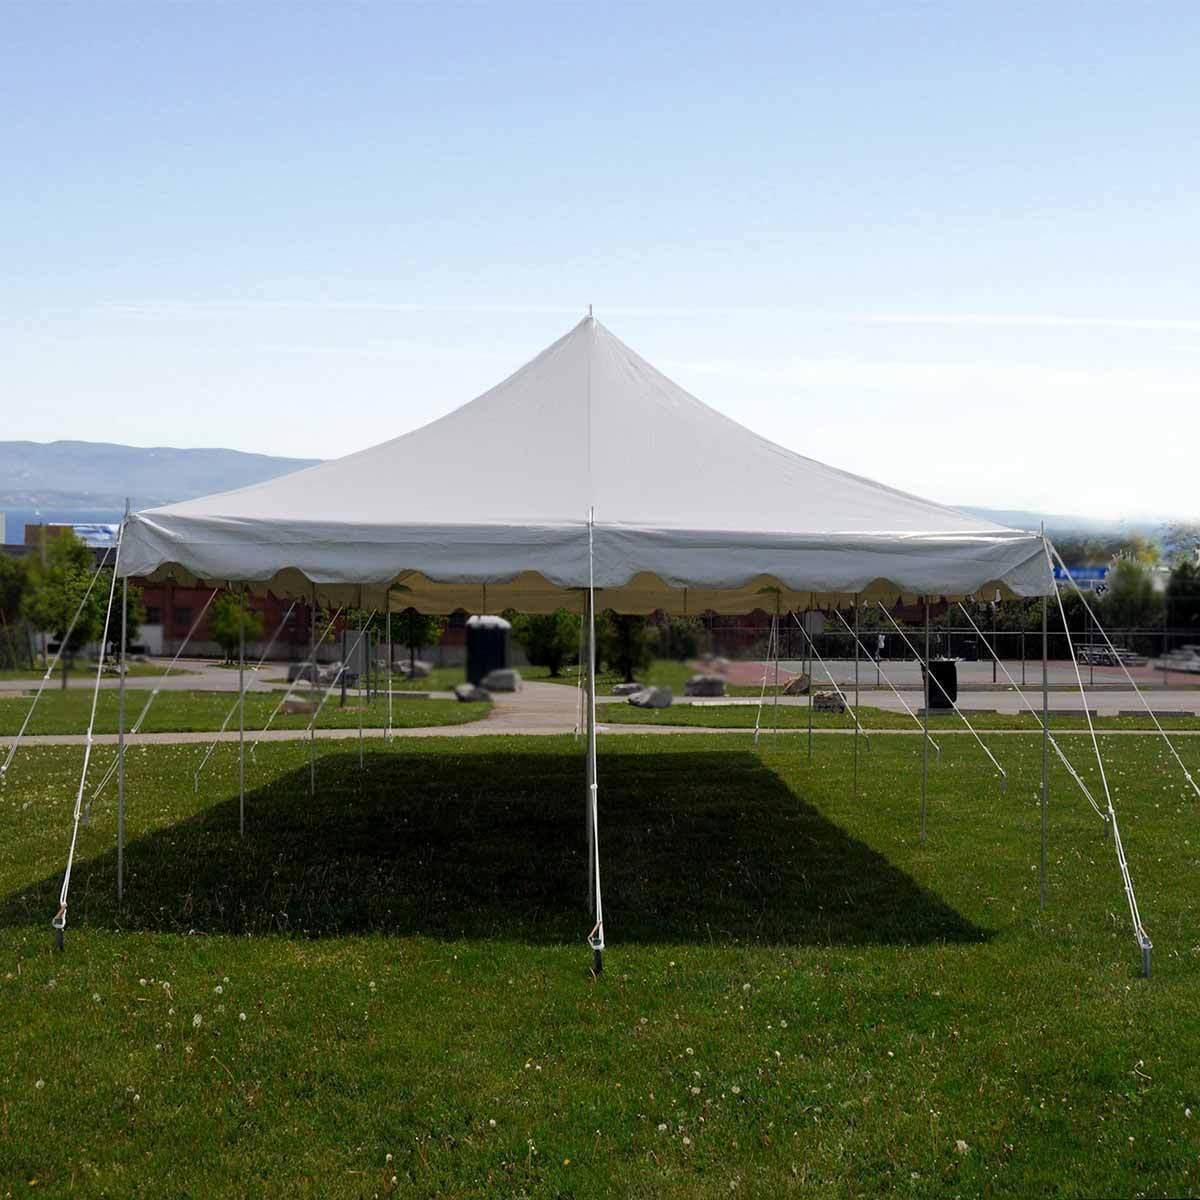 20 X 40 Commercial Pole Tent Canopy Gazebo